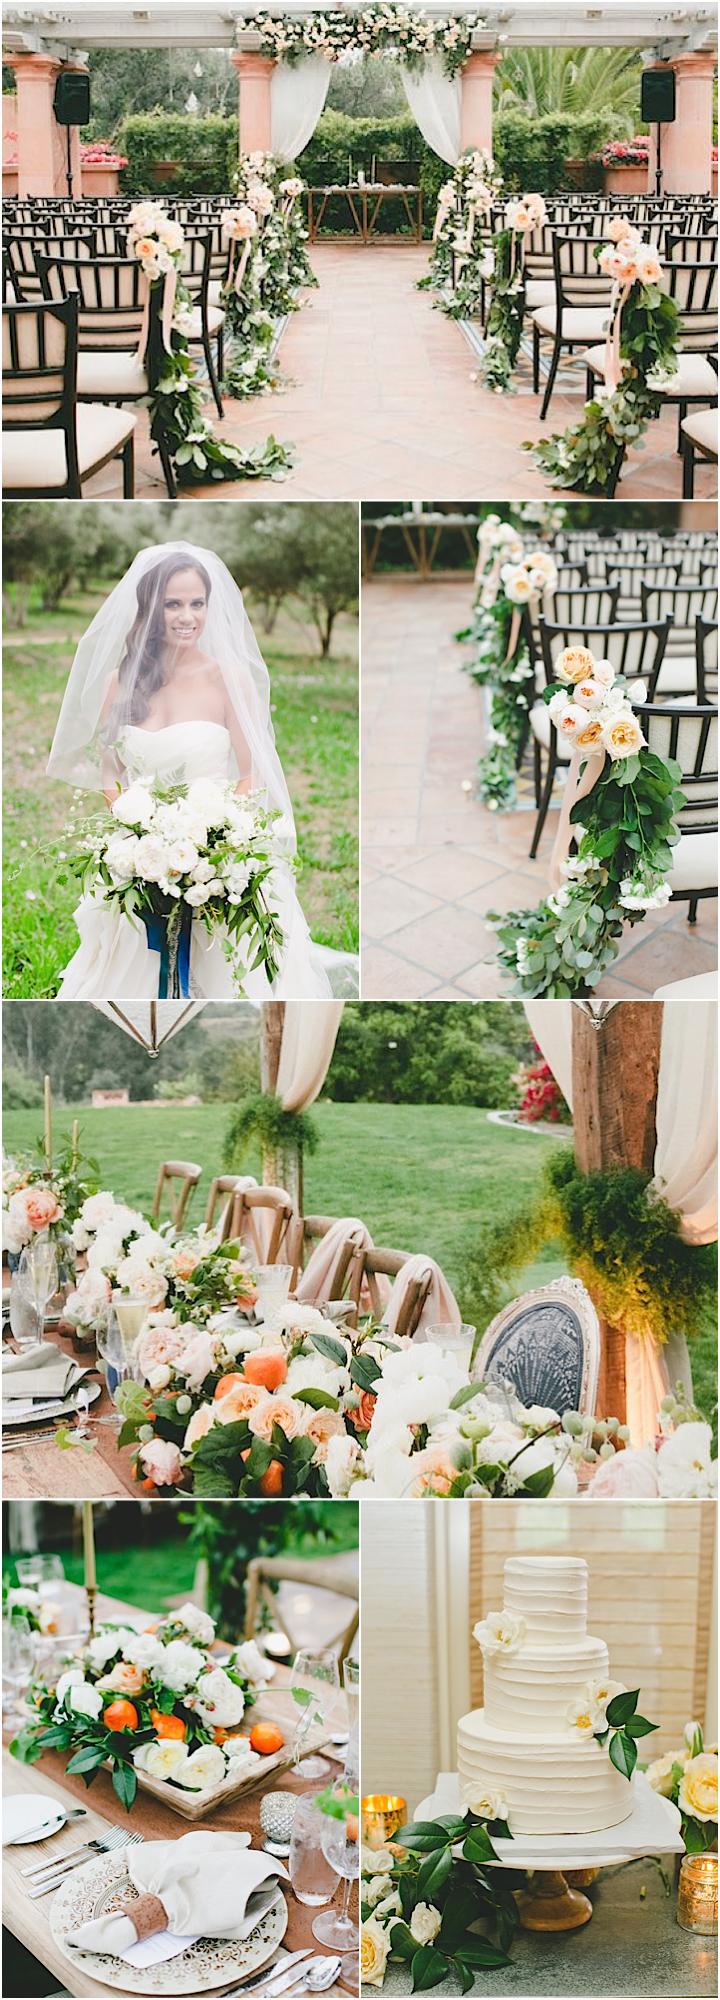 Citrus Inspired California Wedding Outdoor Wedding ReceptionWedding